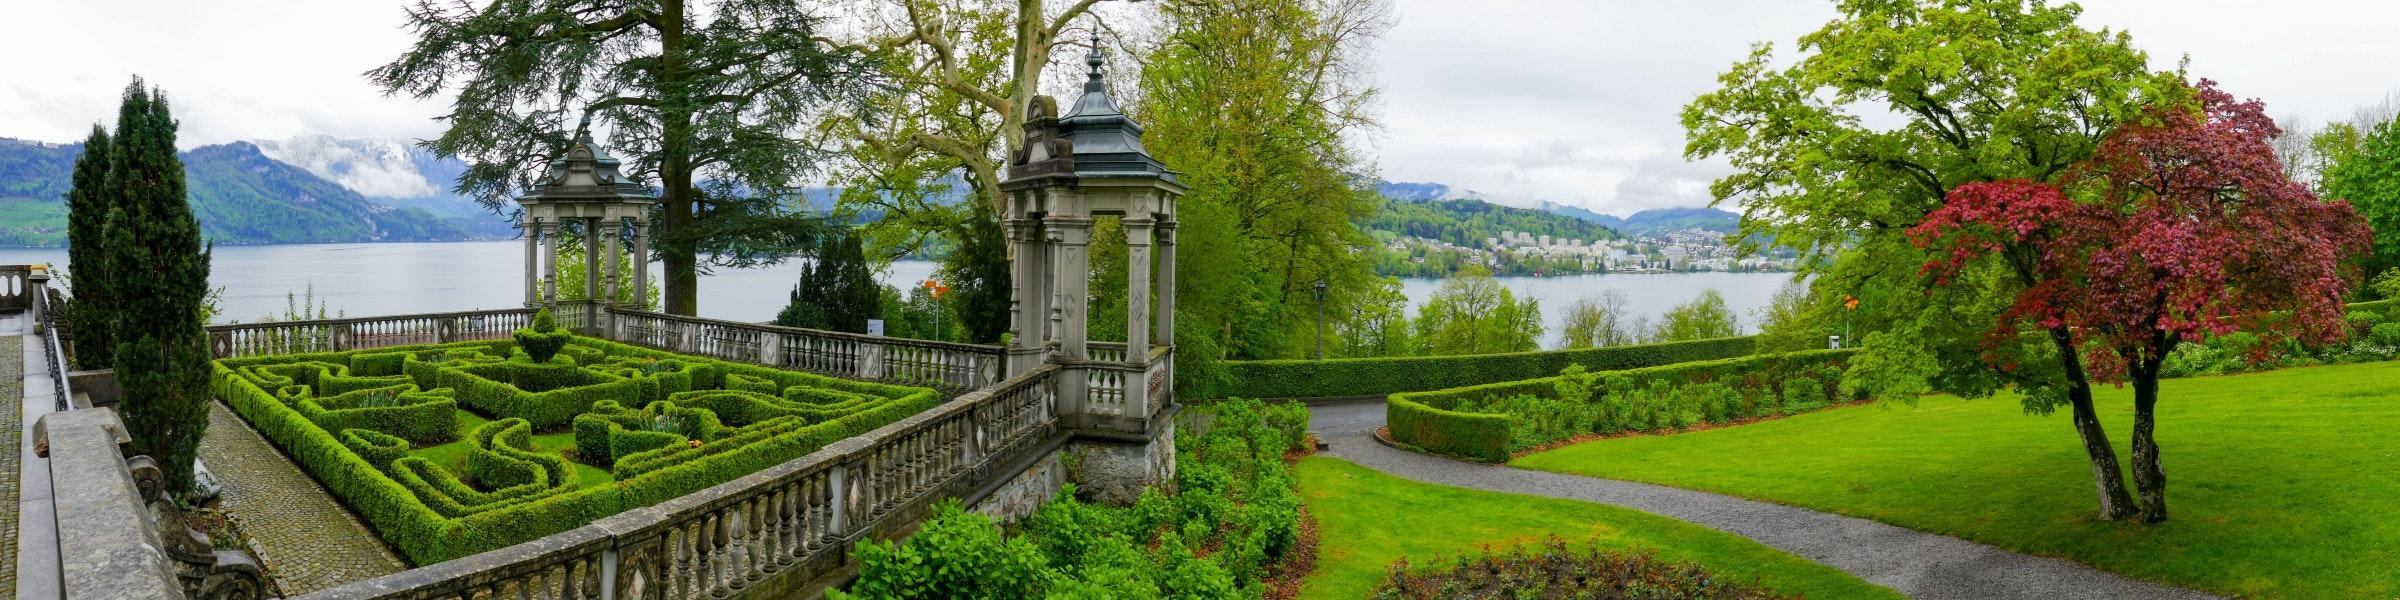 Tuin Schloss Meggenhorn